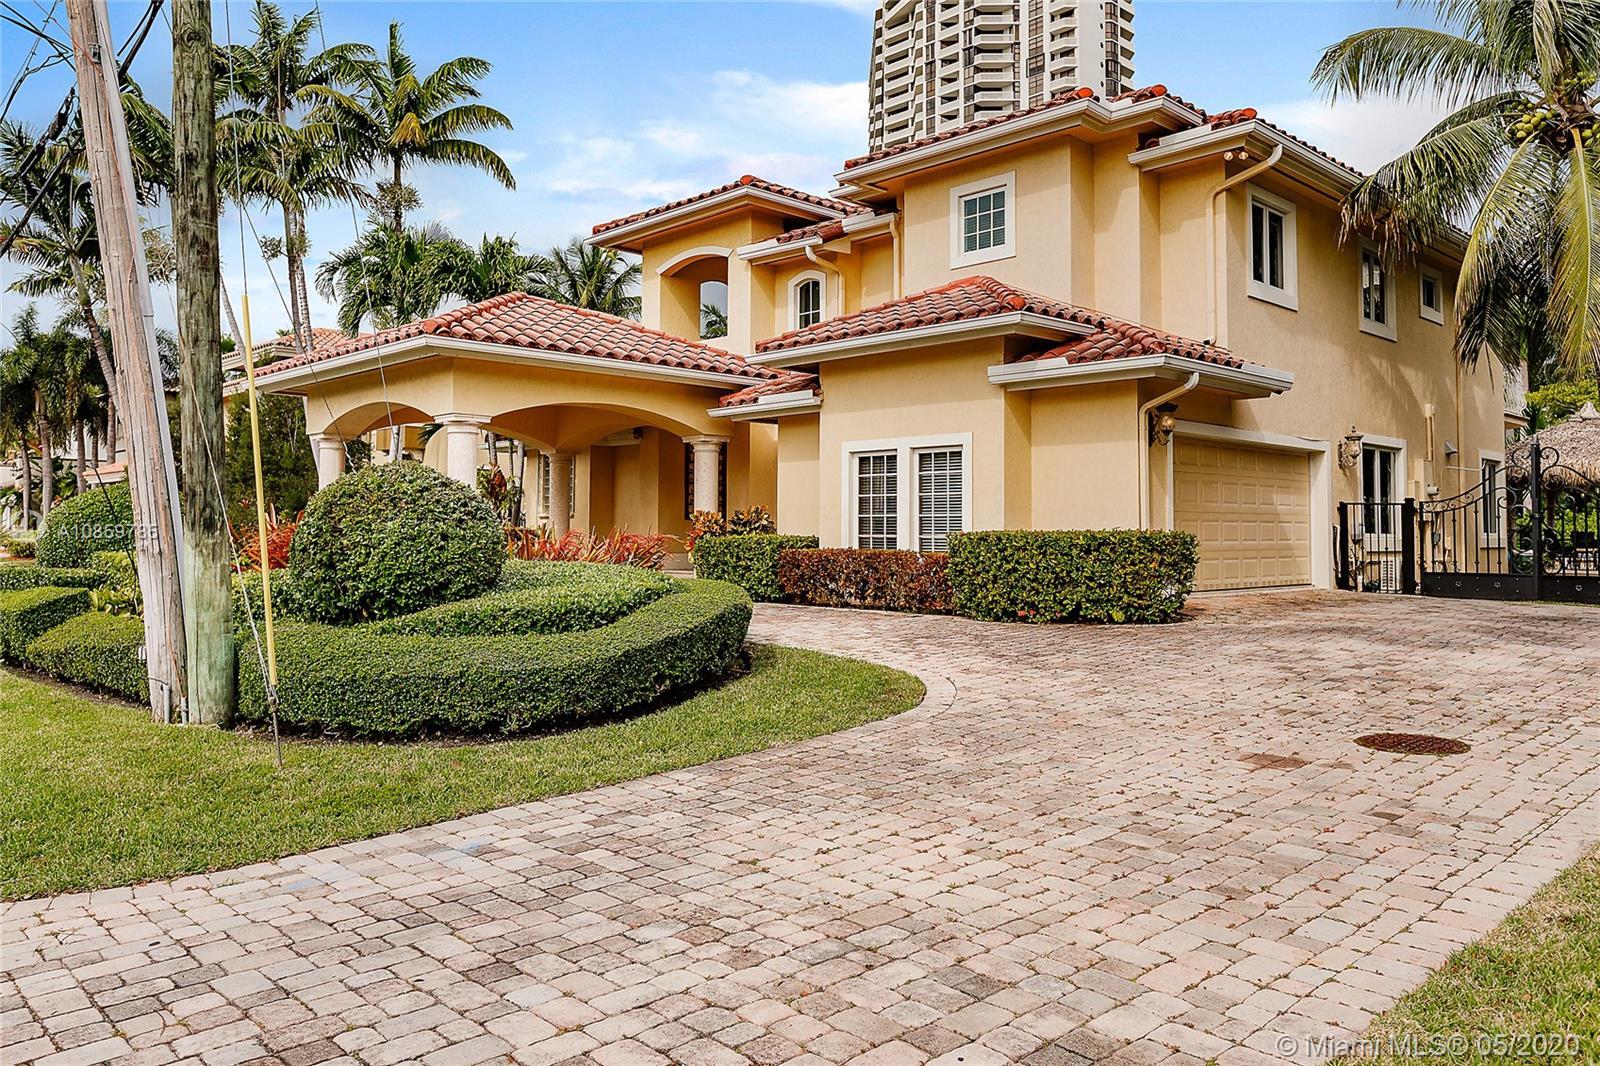 Main property image for  3463 NE 171 ST #